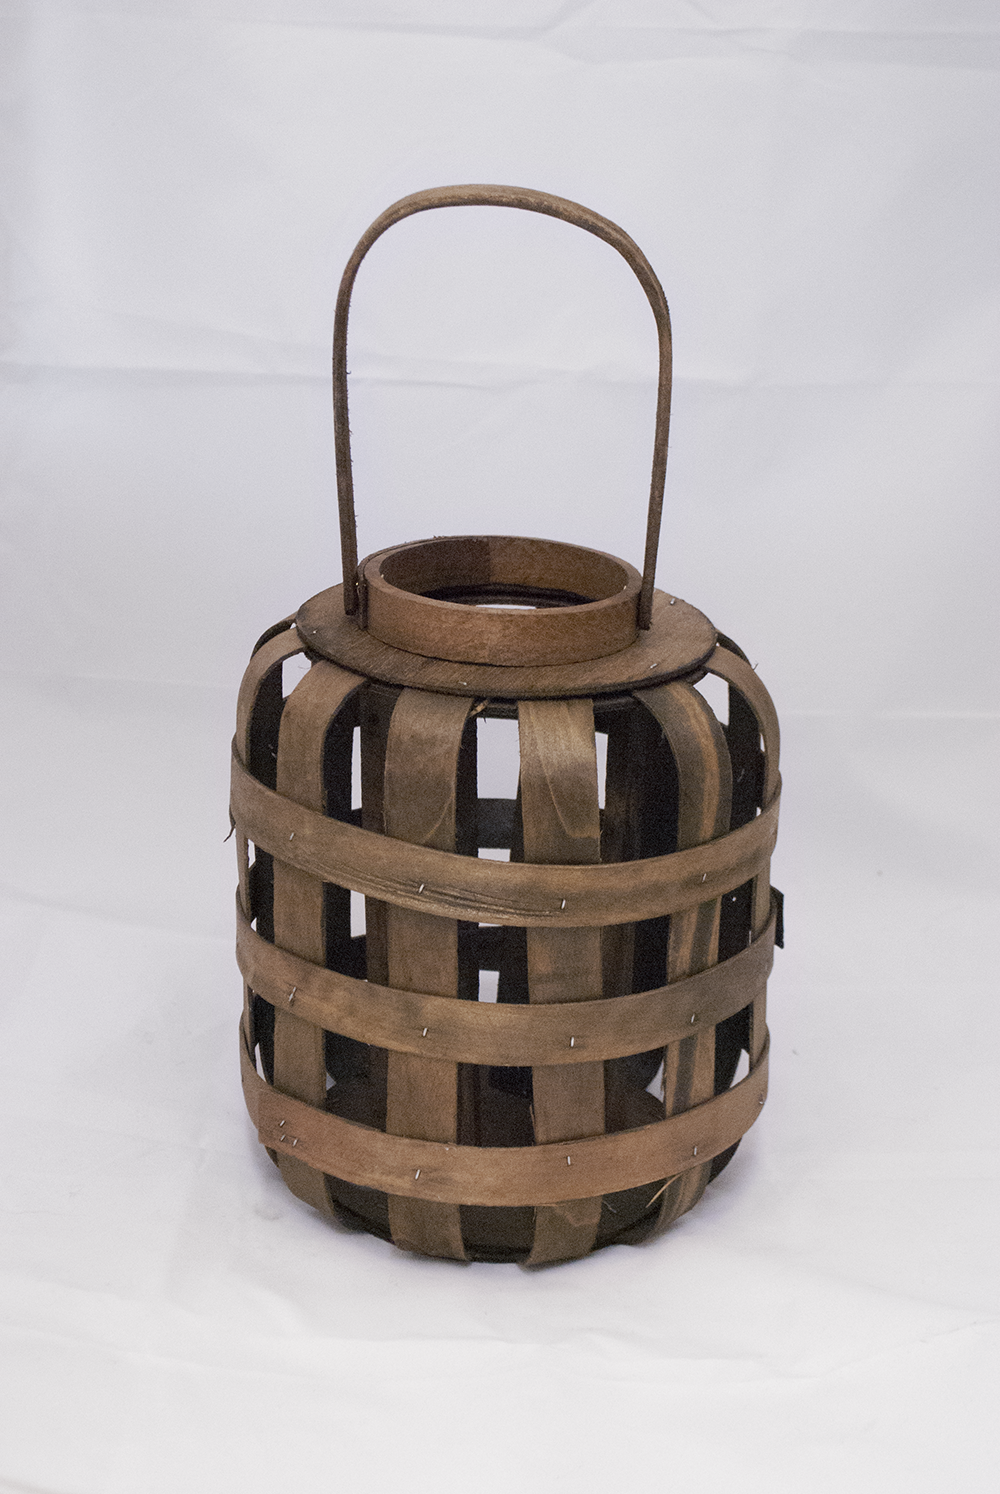 koko Lantern (oval)  weaved wood + glass cylinder  Quantity: 2  Price: $20.00